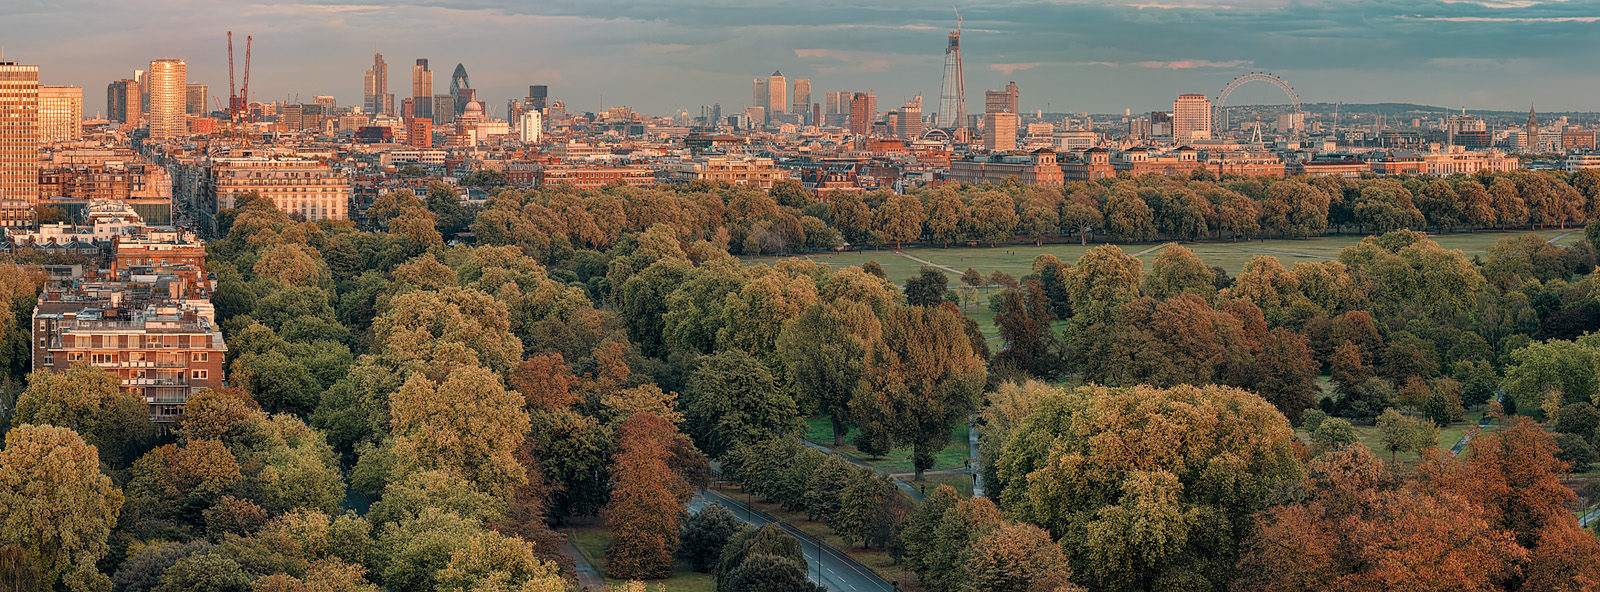 Hyde Park 2011 Acrylic - London hi-res panoramic ciyscape Fine Art Photo